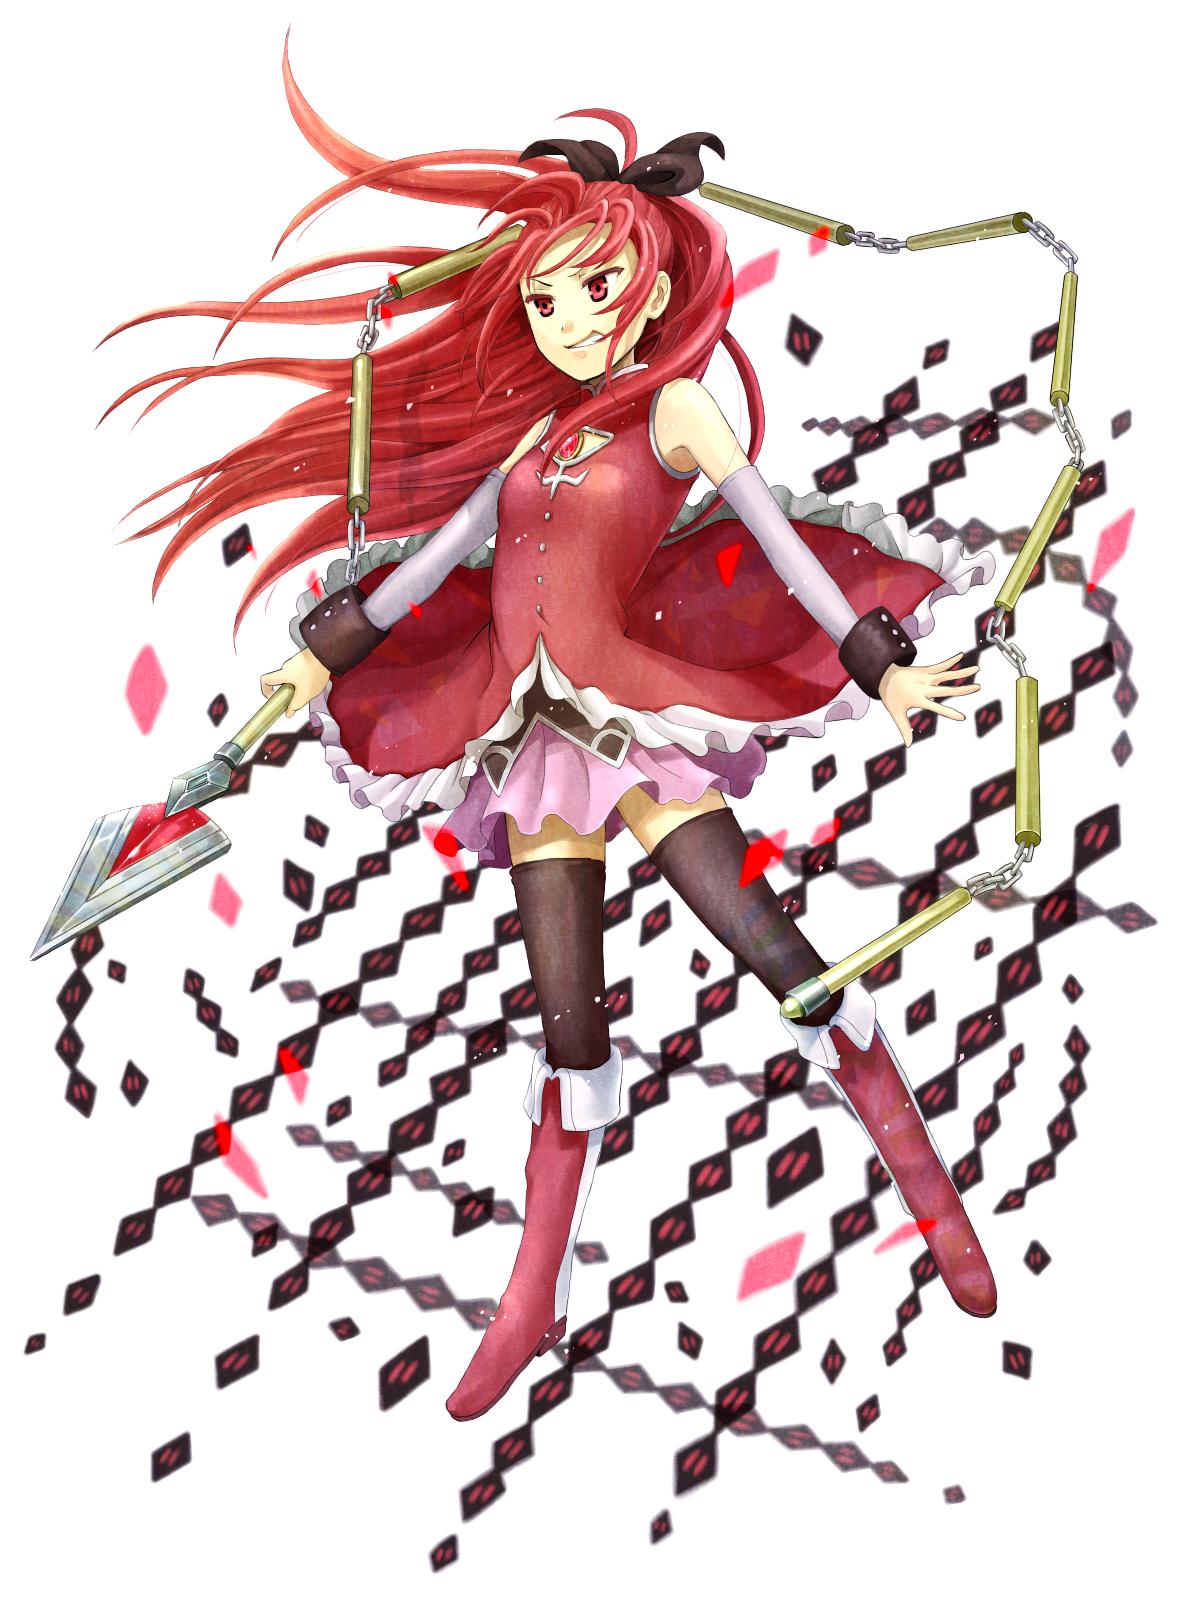 Http E Shuushuu Net Images 2016 10 08 864606 Png Anime Madoka Magica Puella Magi Madoka Magica